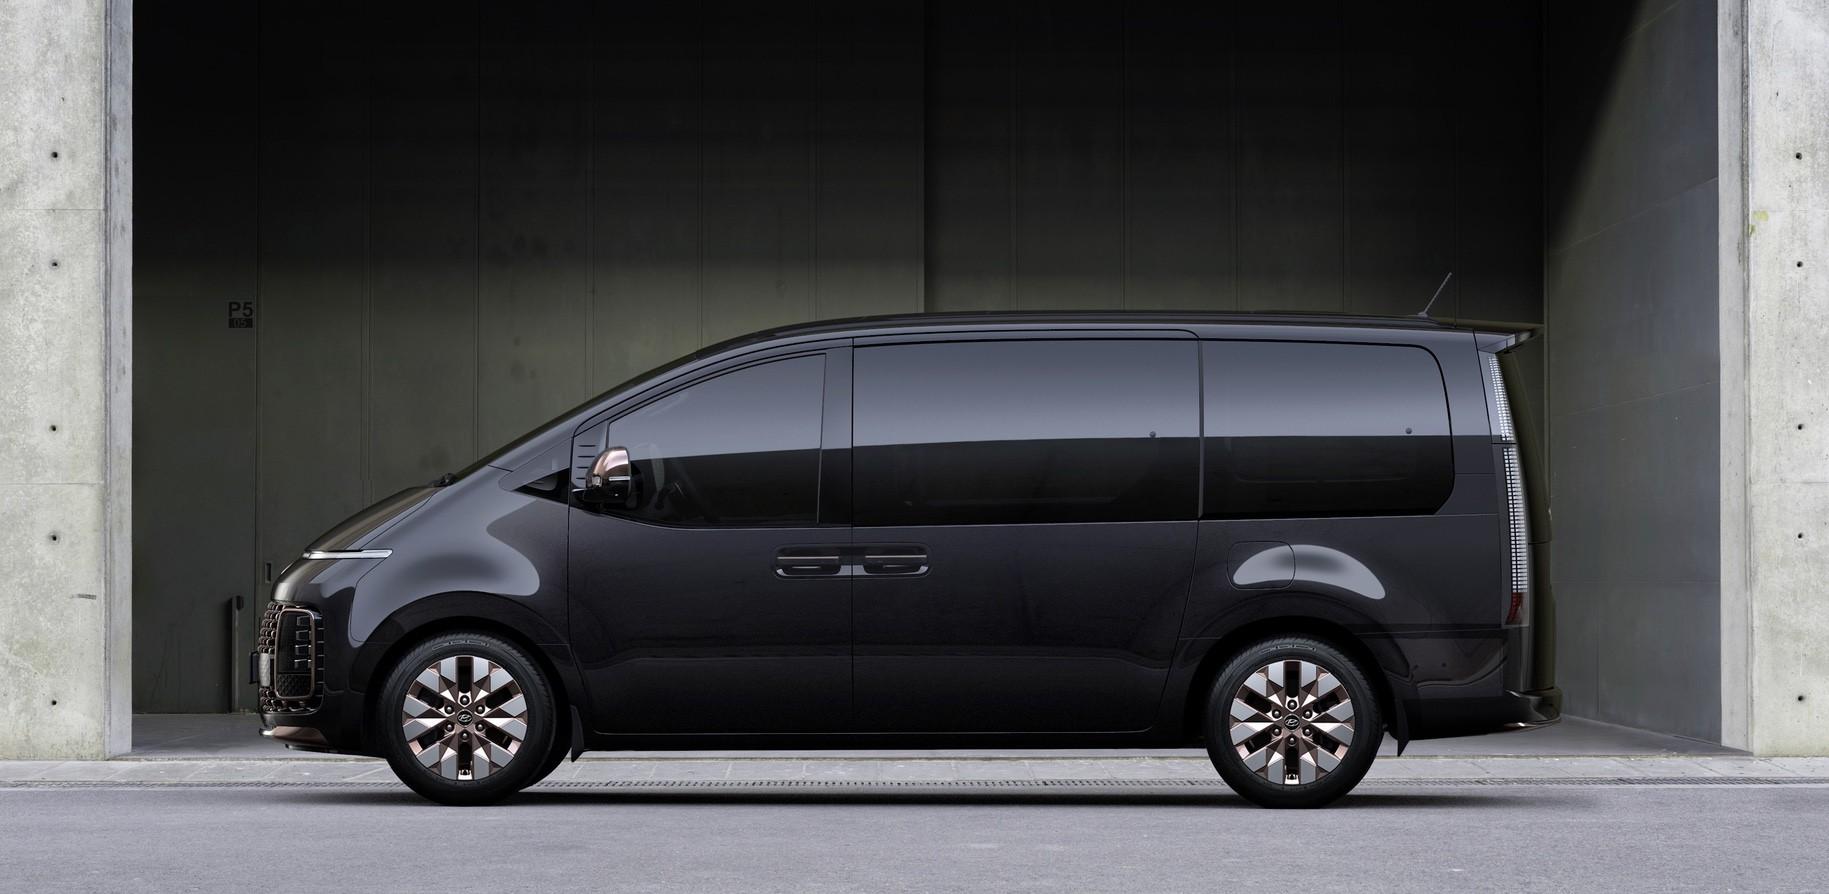 2021_Hyundai_Staria-0003